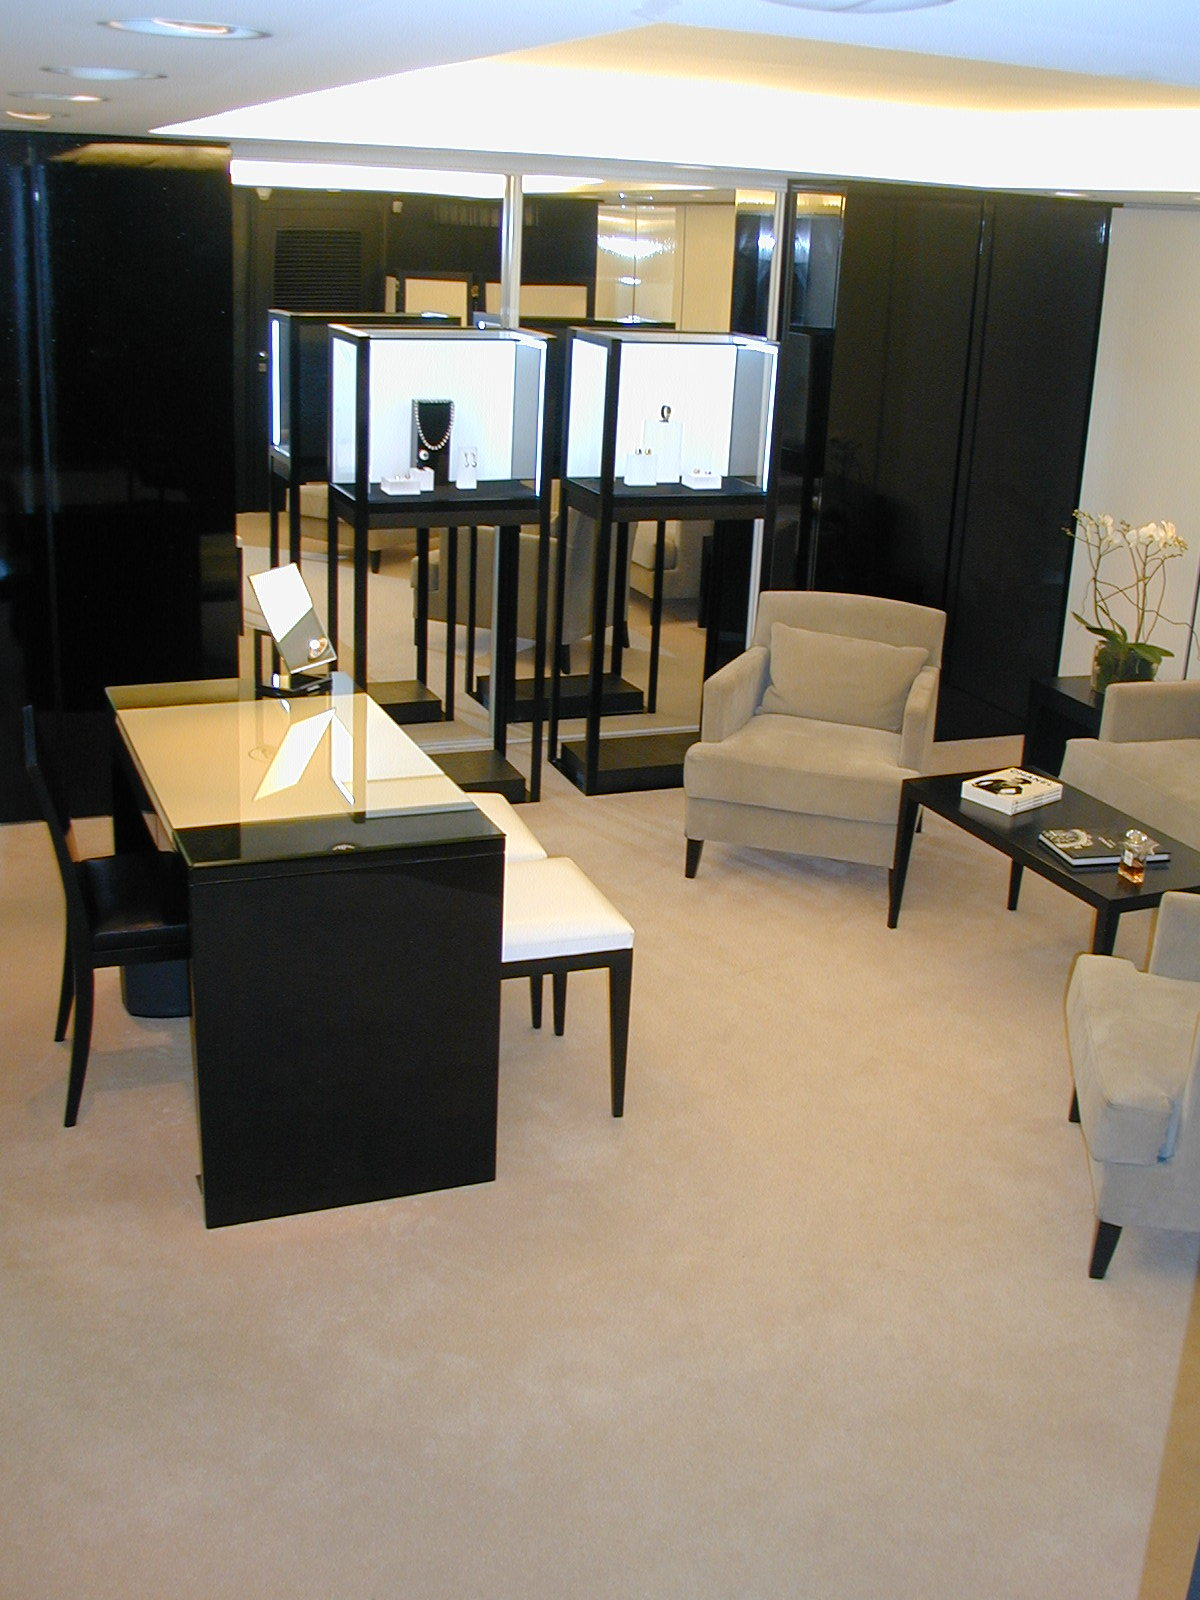 am nagement d une joaillerie chanel cannes atelier meinecke. Black Bedroom Furniture Sets. Home Design Ideas